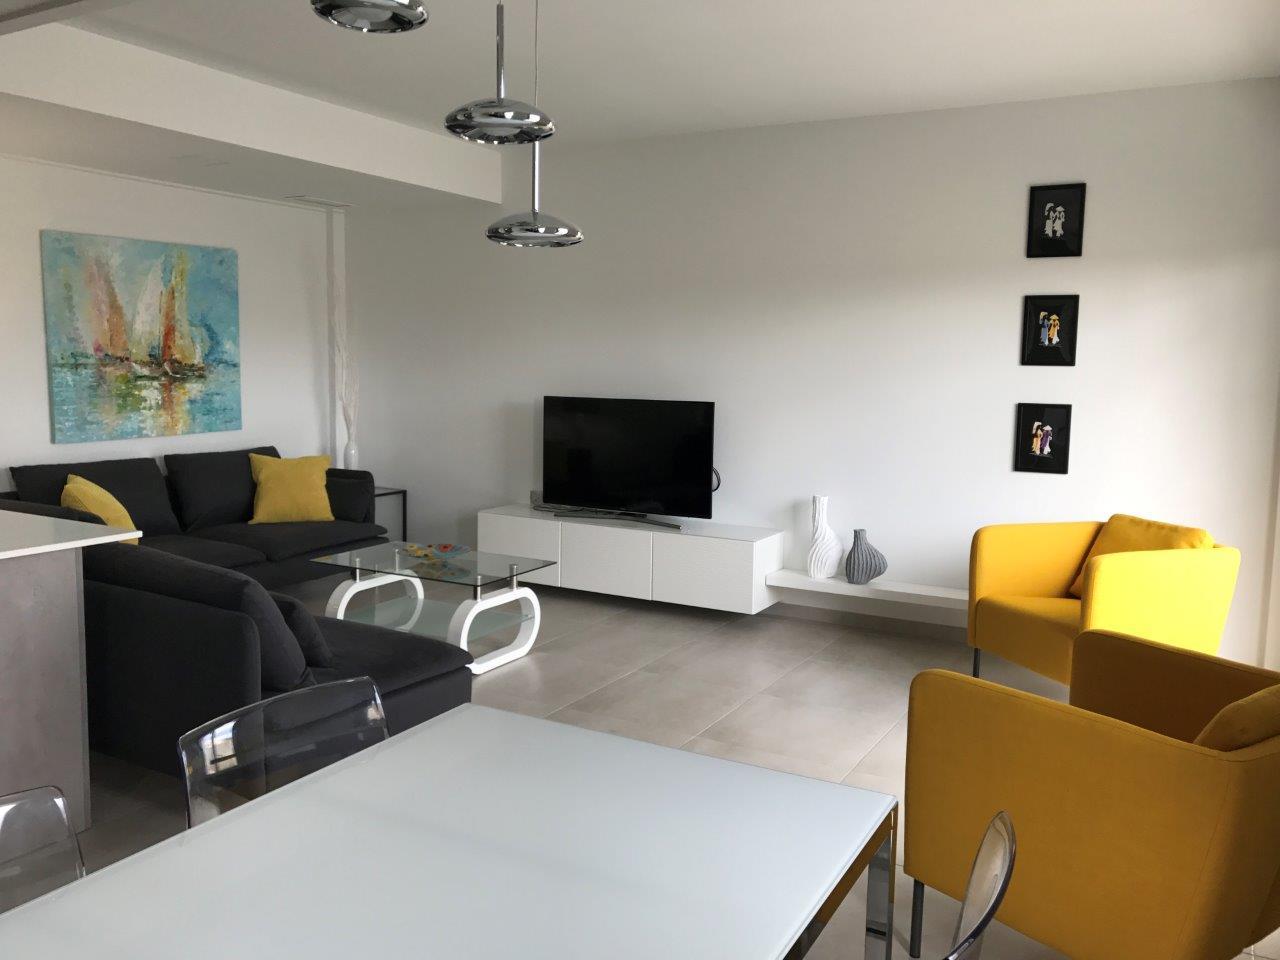 vakantiewoning huren in villa amalia